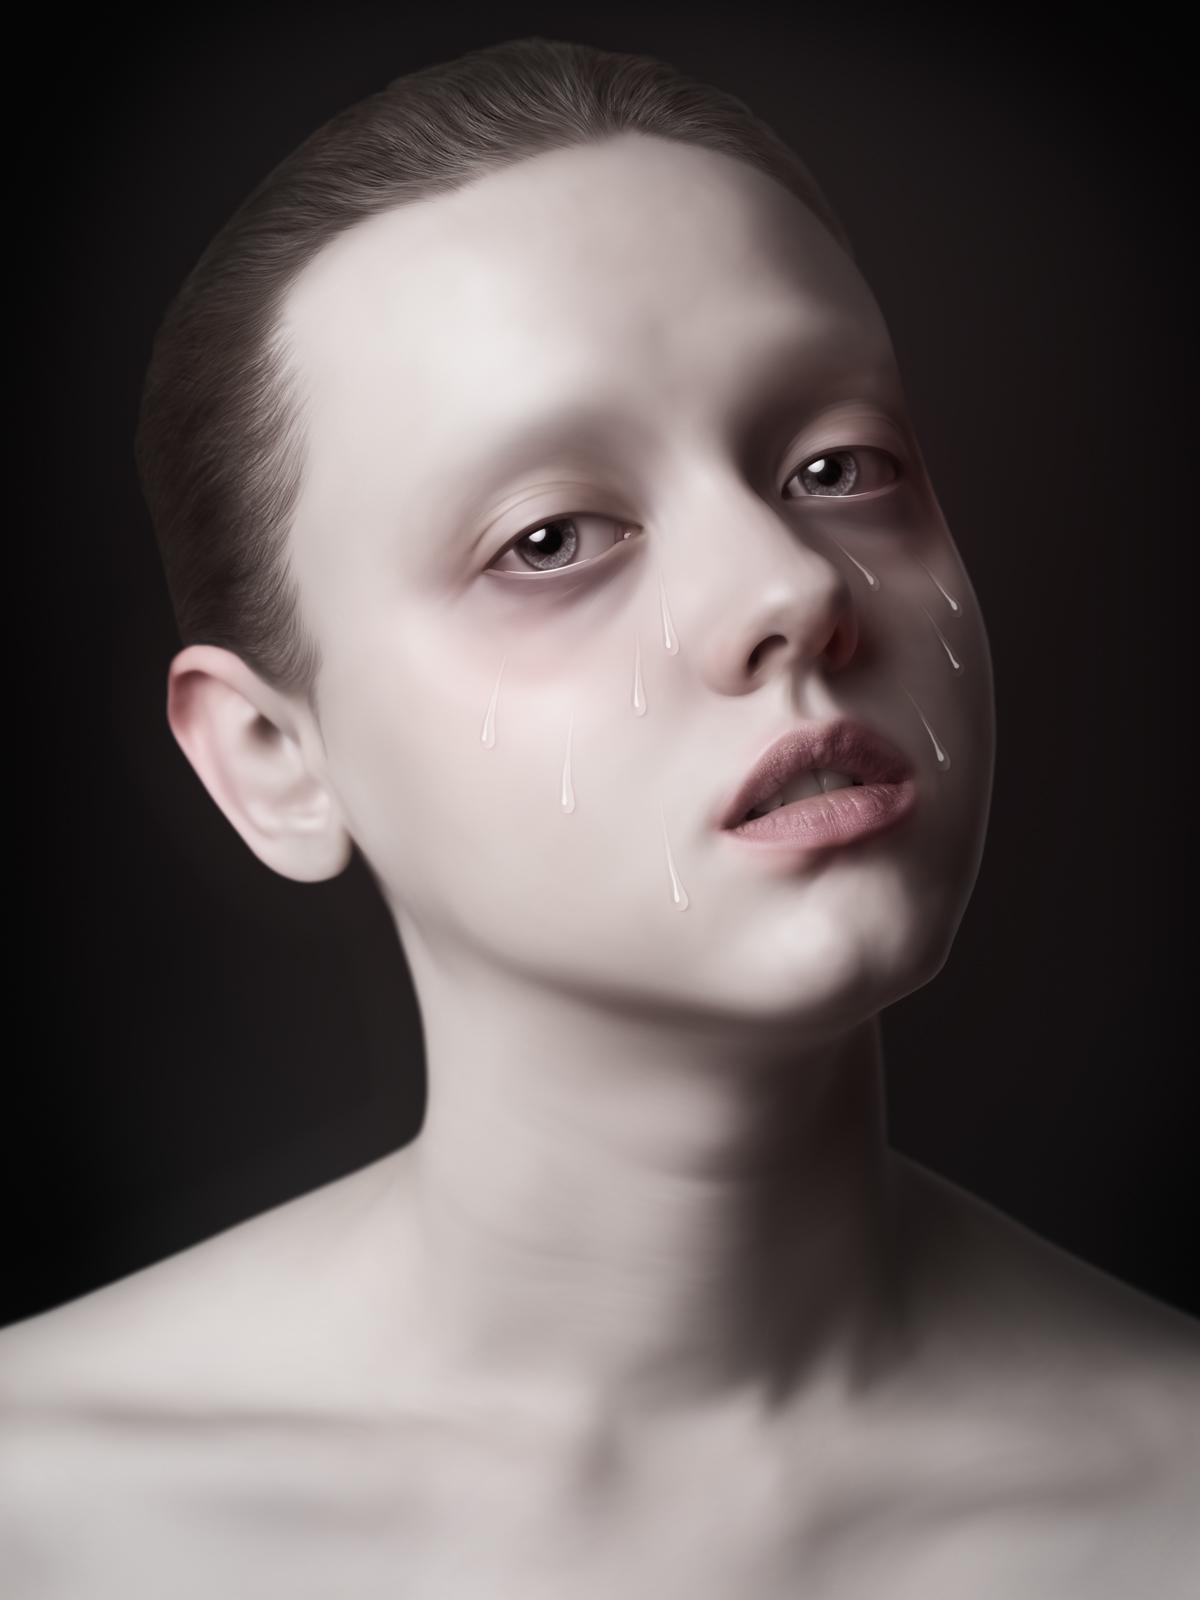 9_Tears_20x30cm.jpg